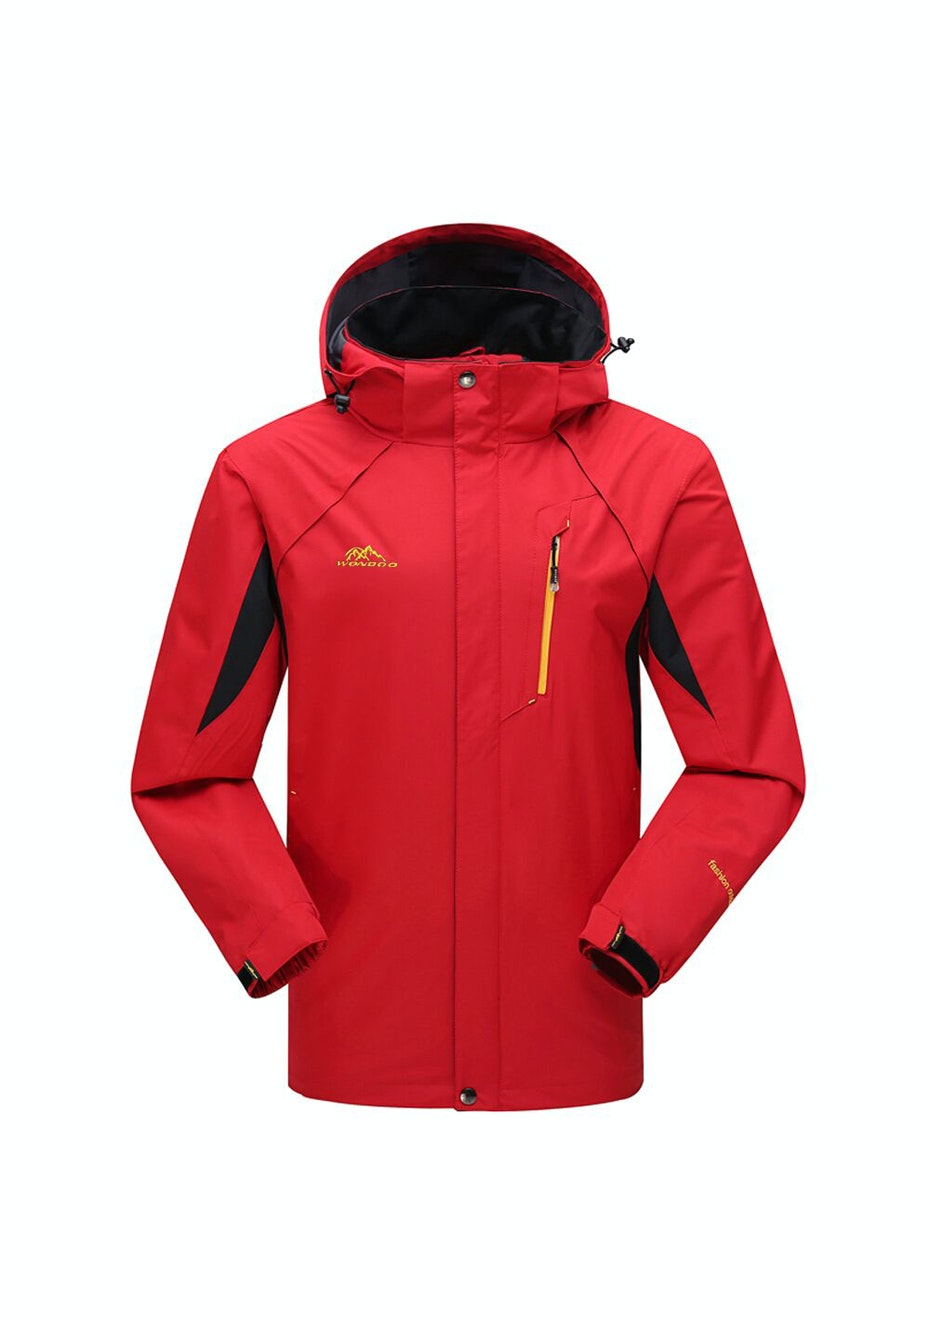 Men 2-in-1 WaterProof Jackets - Red / Black